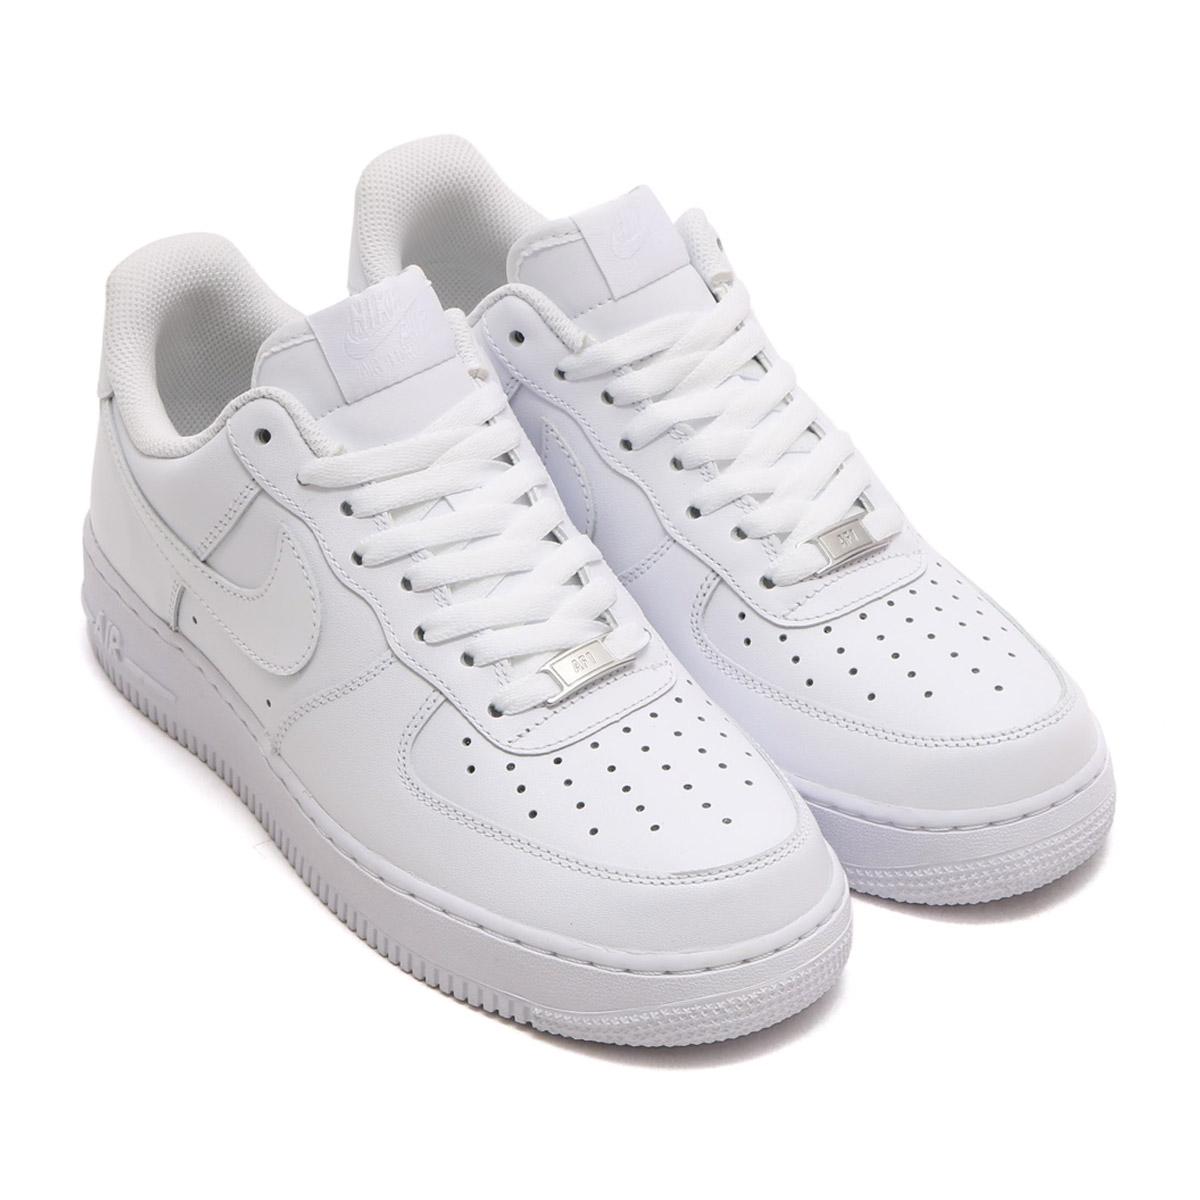 b4550407650a NIKE AIR FORCE 1   07 (Nike Air Force 1   07) WHITE WHITE CRYOVR